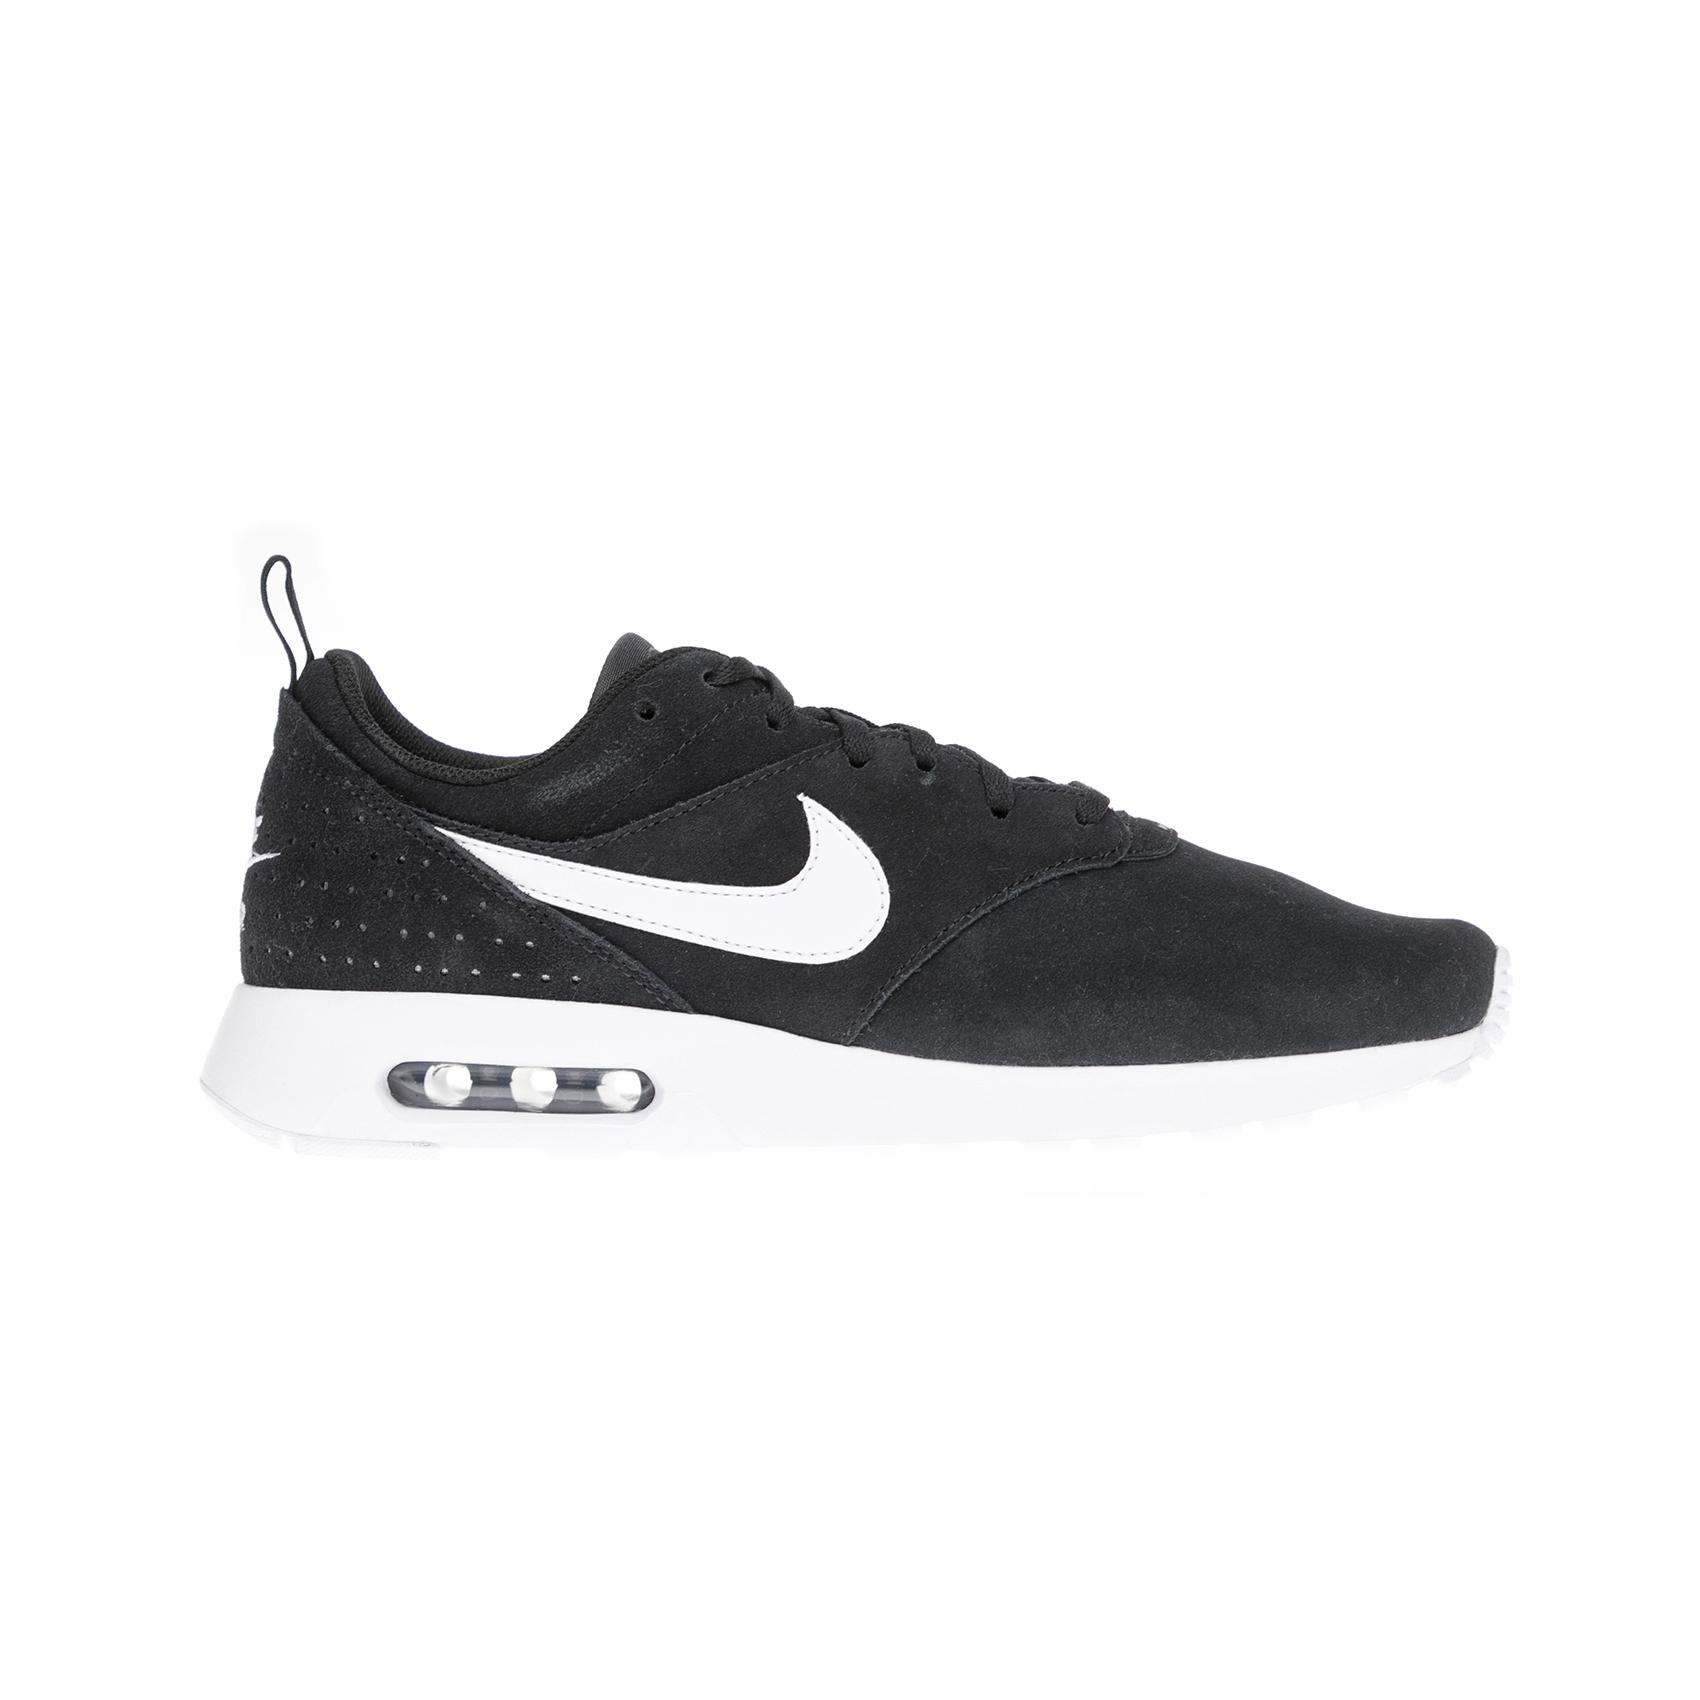 NIKE - Αντρικά παπούτσια NIKE AIR MAX TAVAS LTR μαύρα ανδρικά παπούτσια αθλητικά running